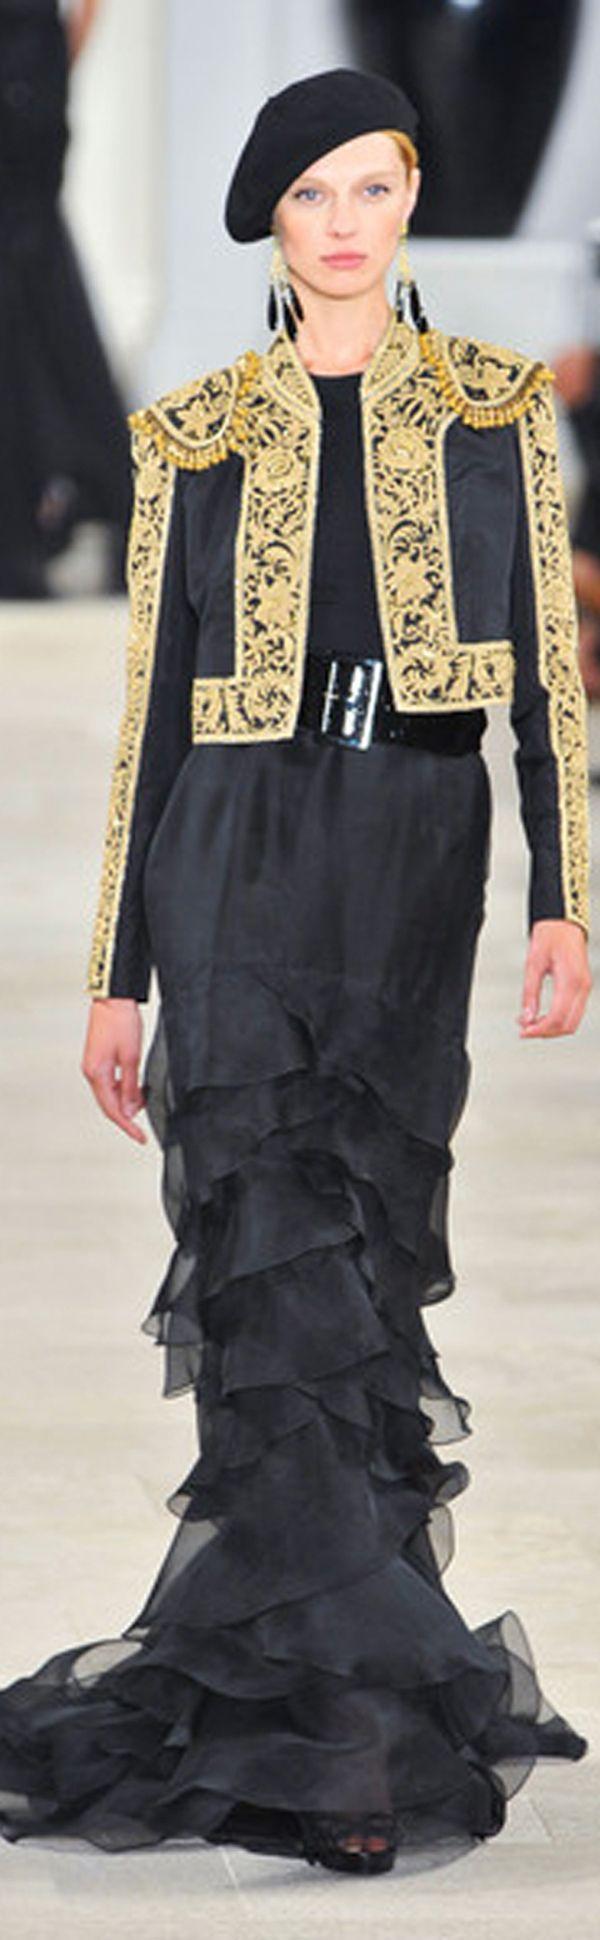 34 Best Barok Fashion Images On Pinterest Baroque 17th Century Fashion And Shelf